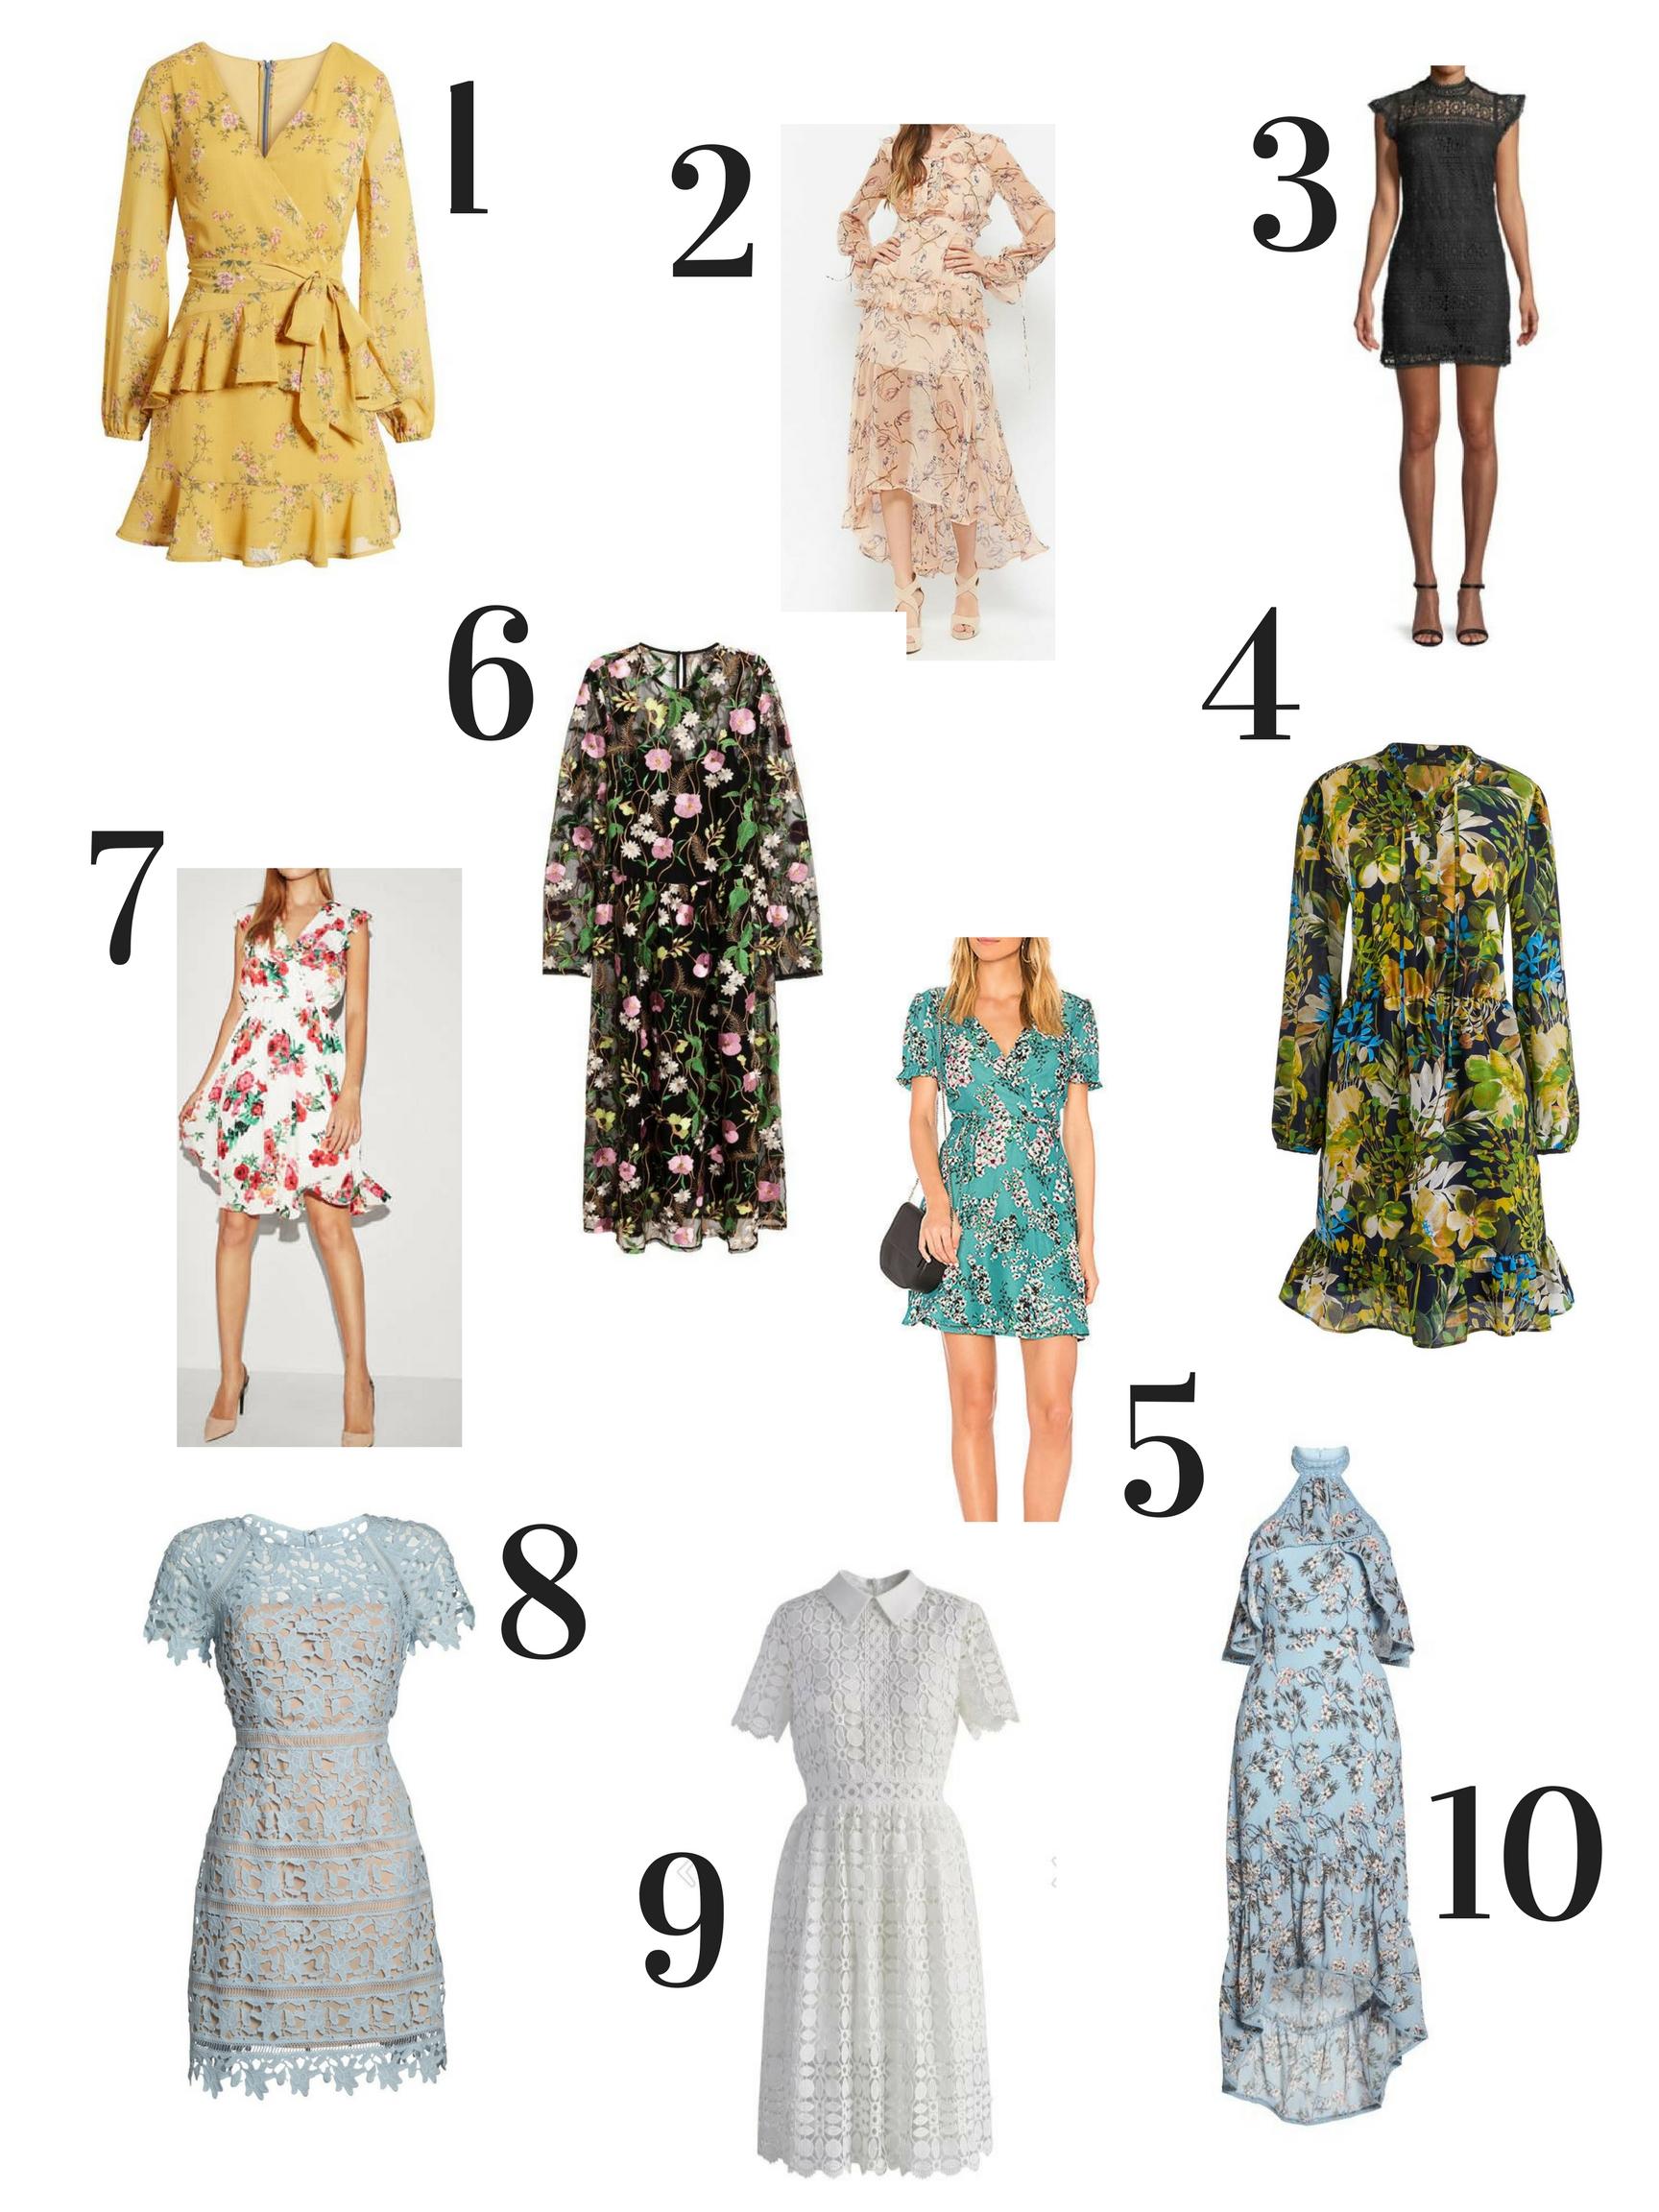 Spring Outfit ideas- Spring Dresses - Outfit Ideas for Women - Spring Fashion-  www.heartandseam.com  #heartandseam #springoutfits